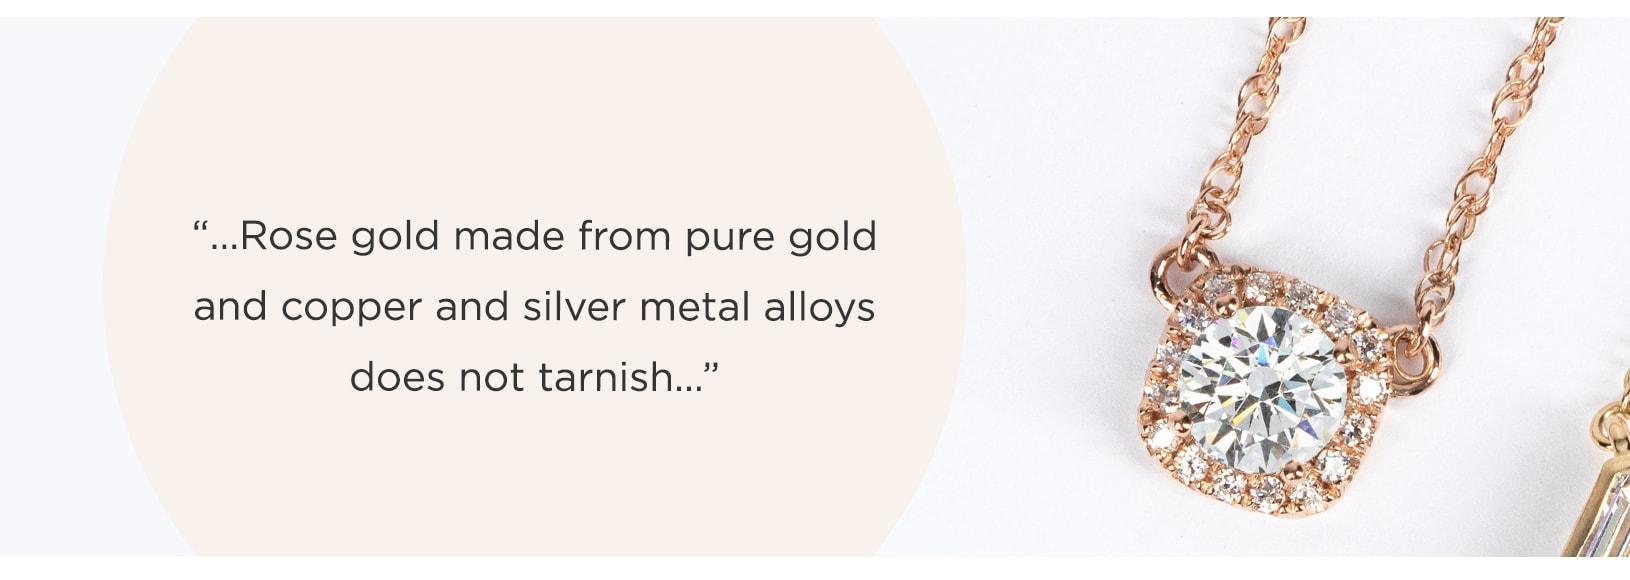 Rose gold will not tarnish